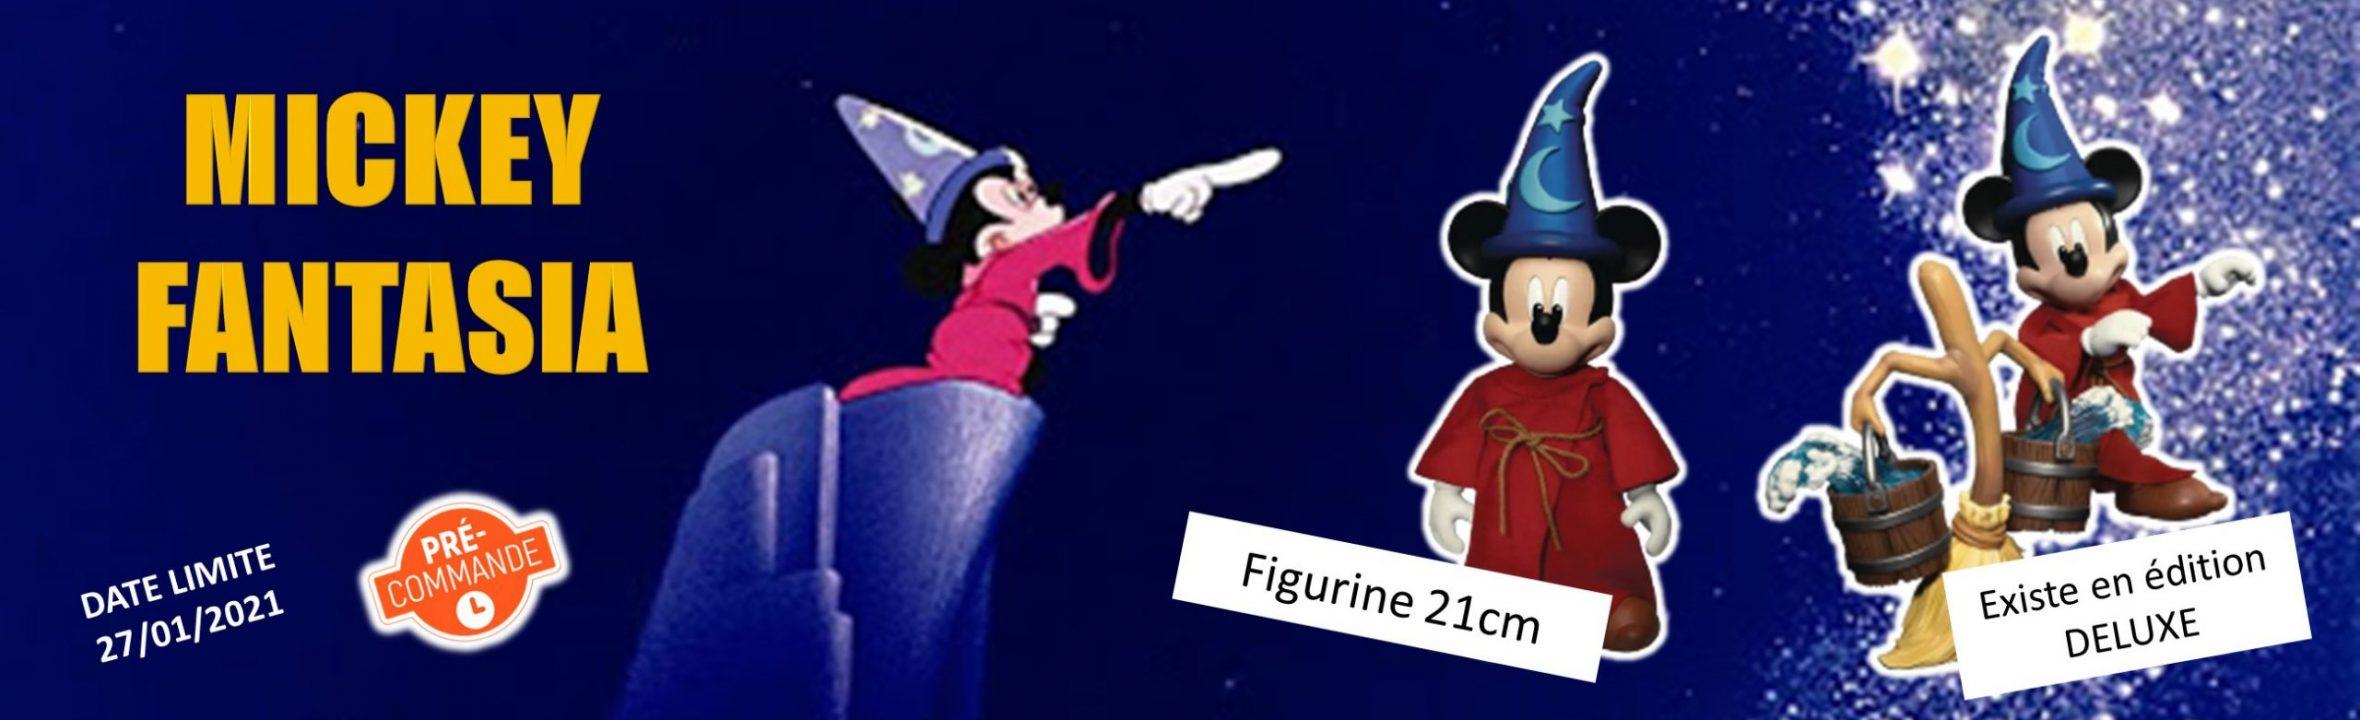 figurine disney mickey fantasia dynamic action heroes 21cm goodin shop